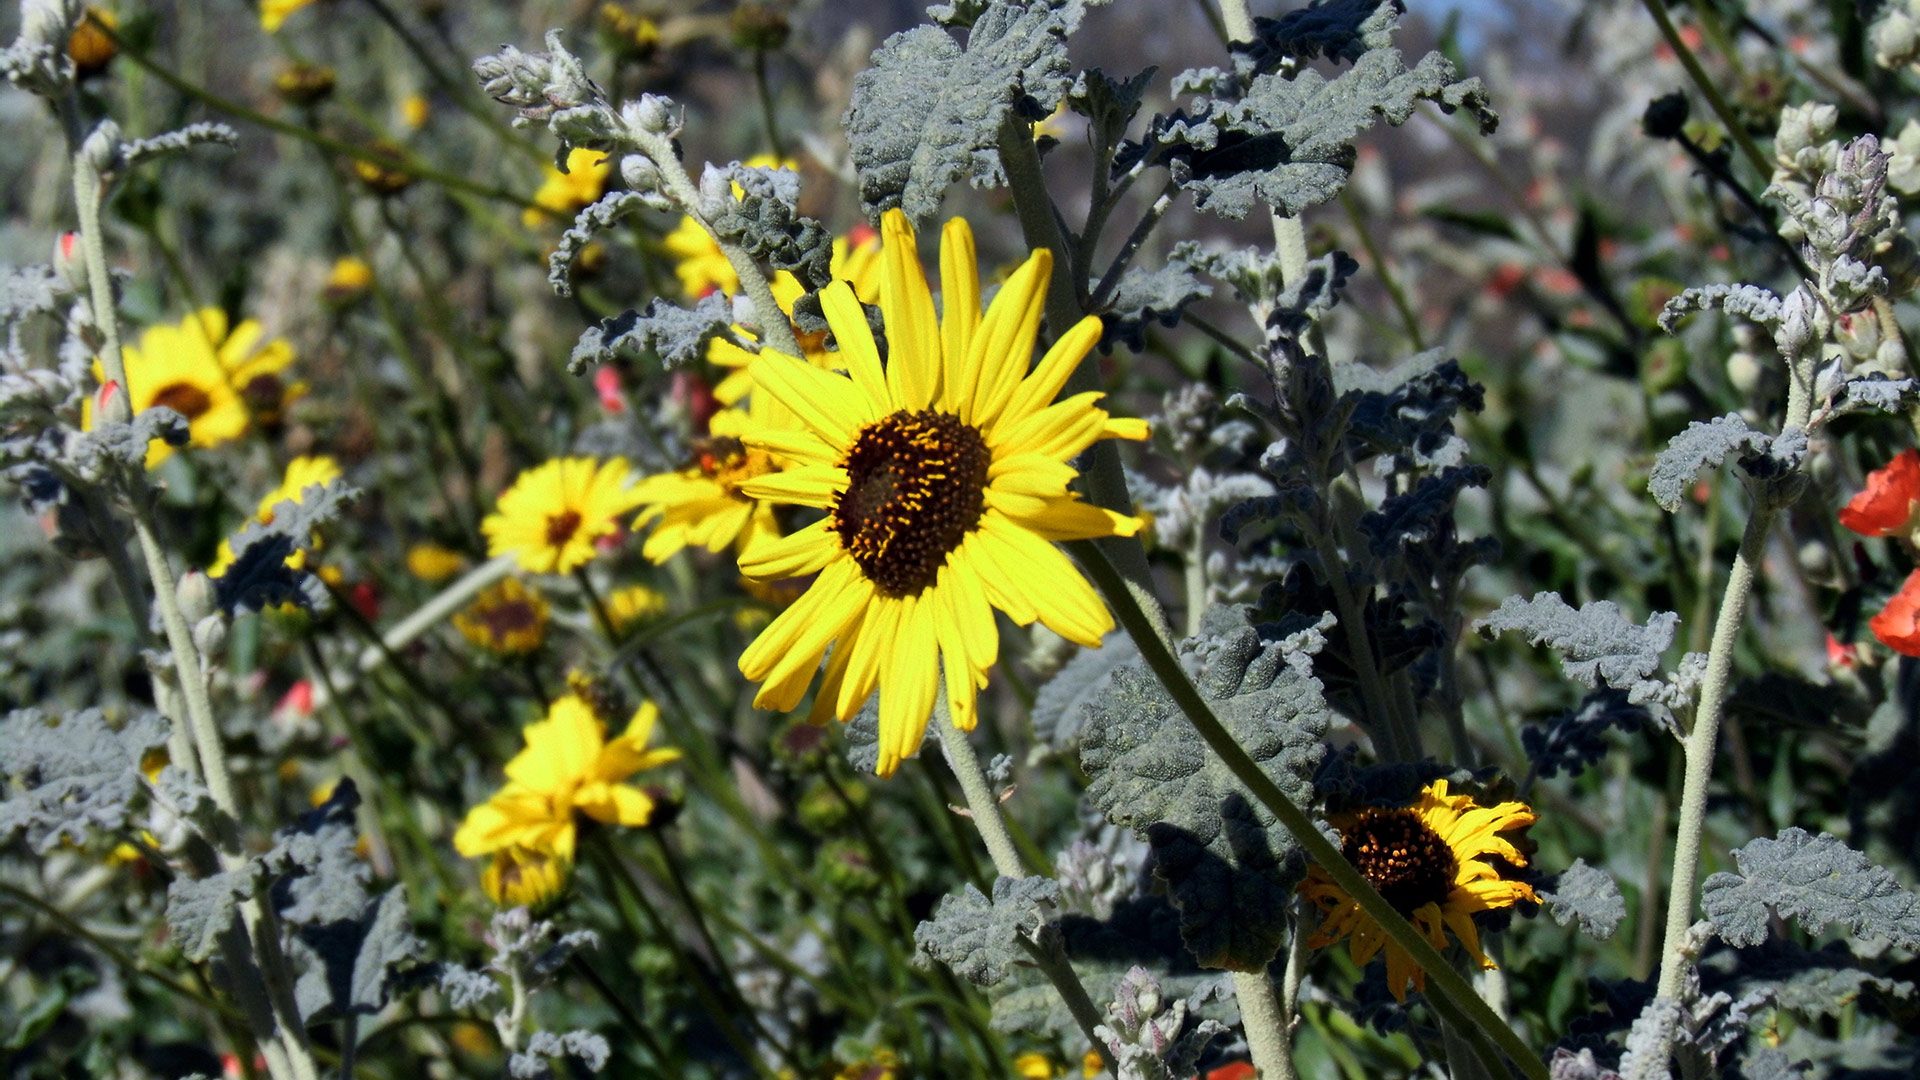 A sunflower at Rio de Los Angeles State Park. | Sandi Hemmerlein